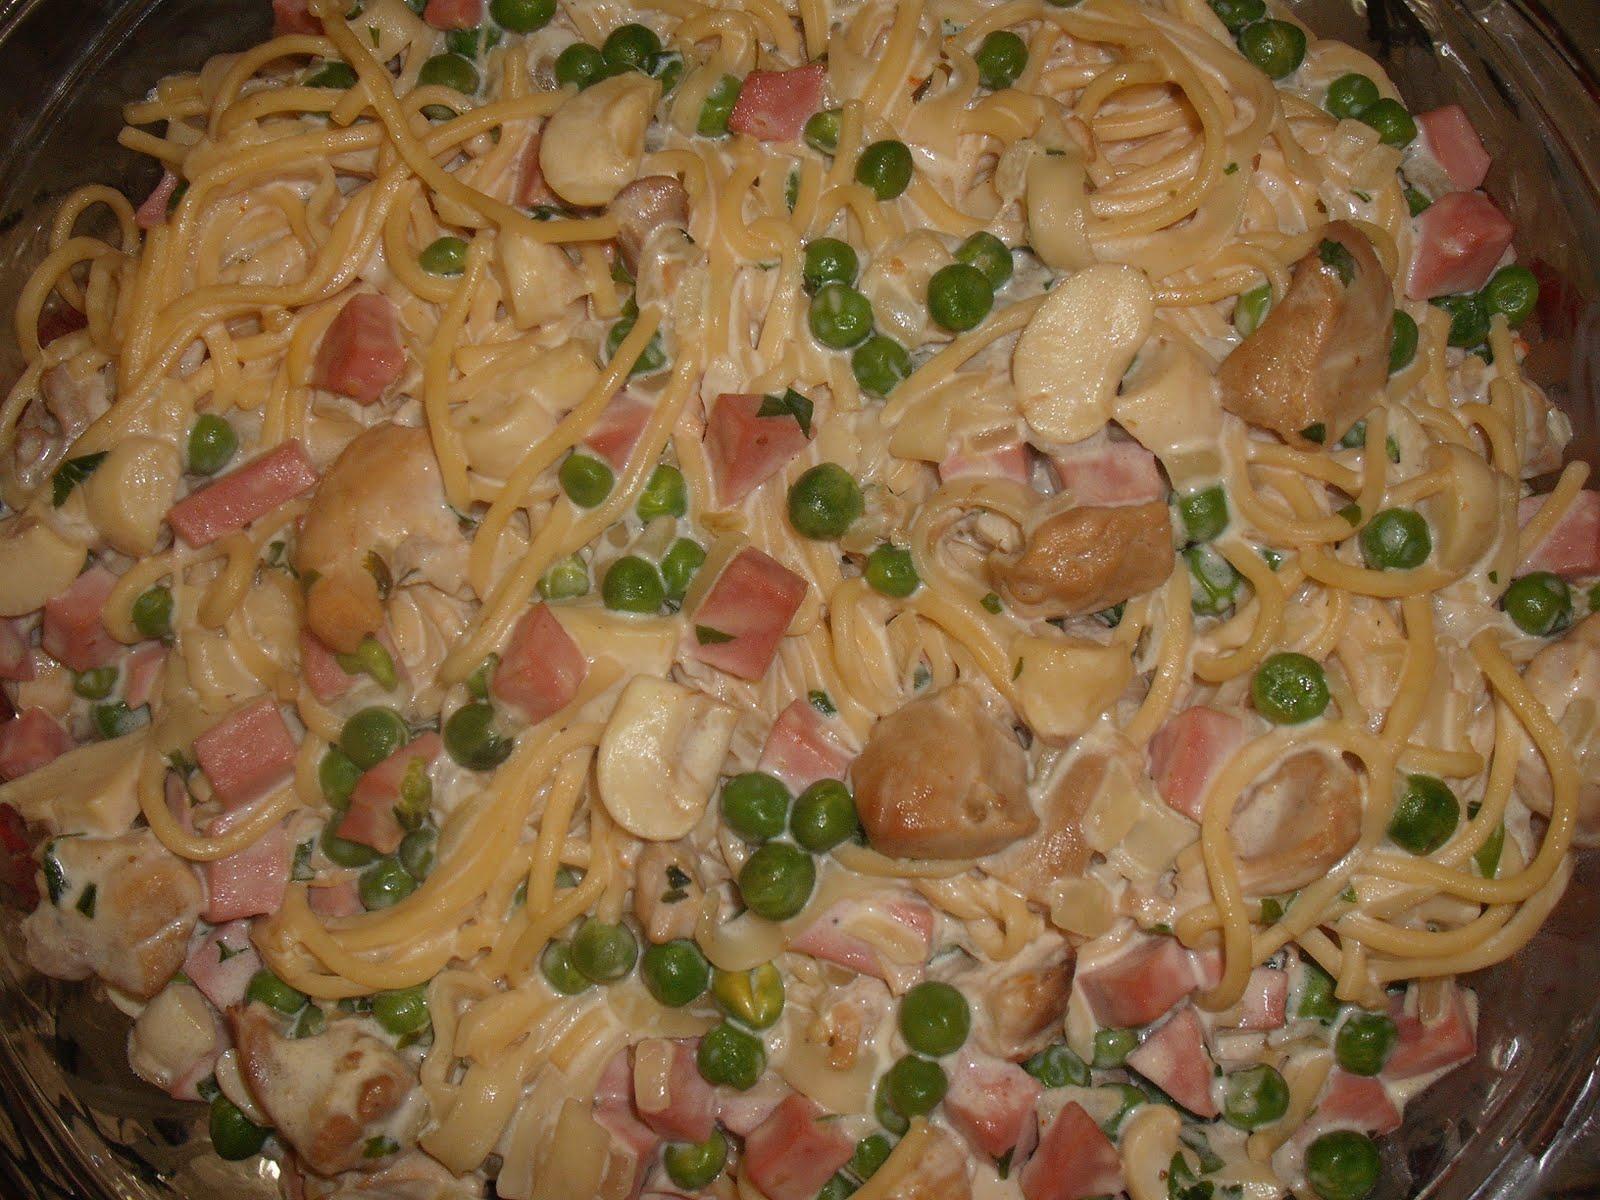 Cad a receita espaguete francesa for Tipos de comida francesa